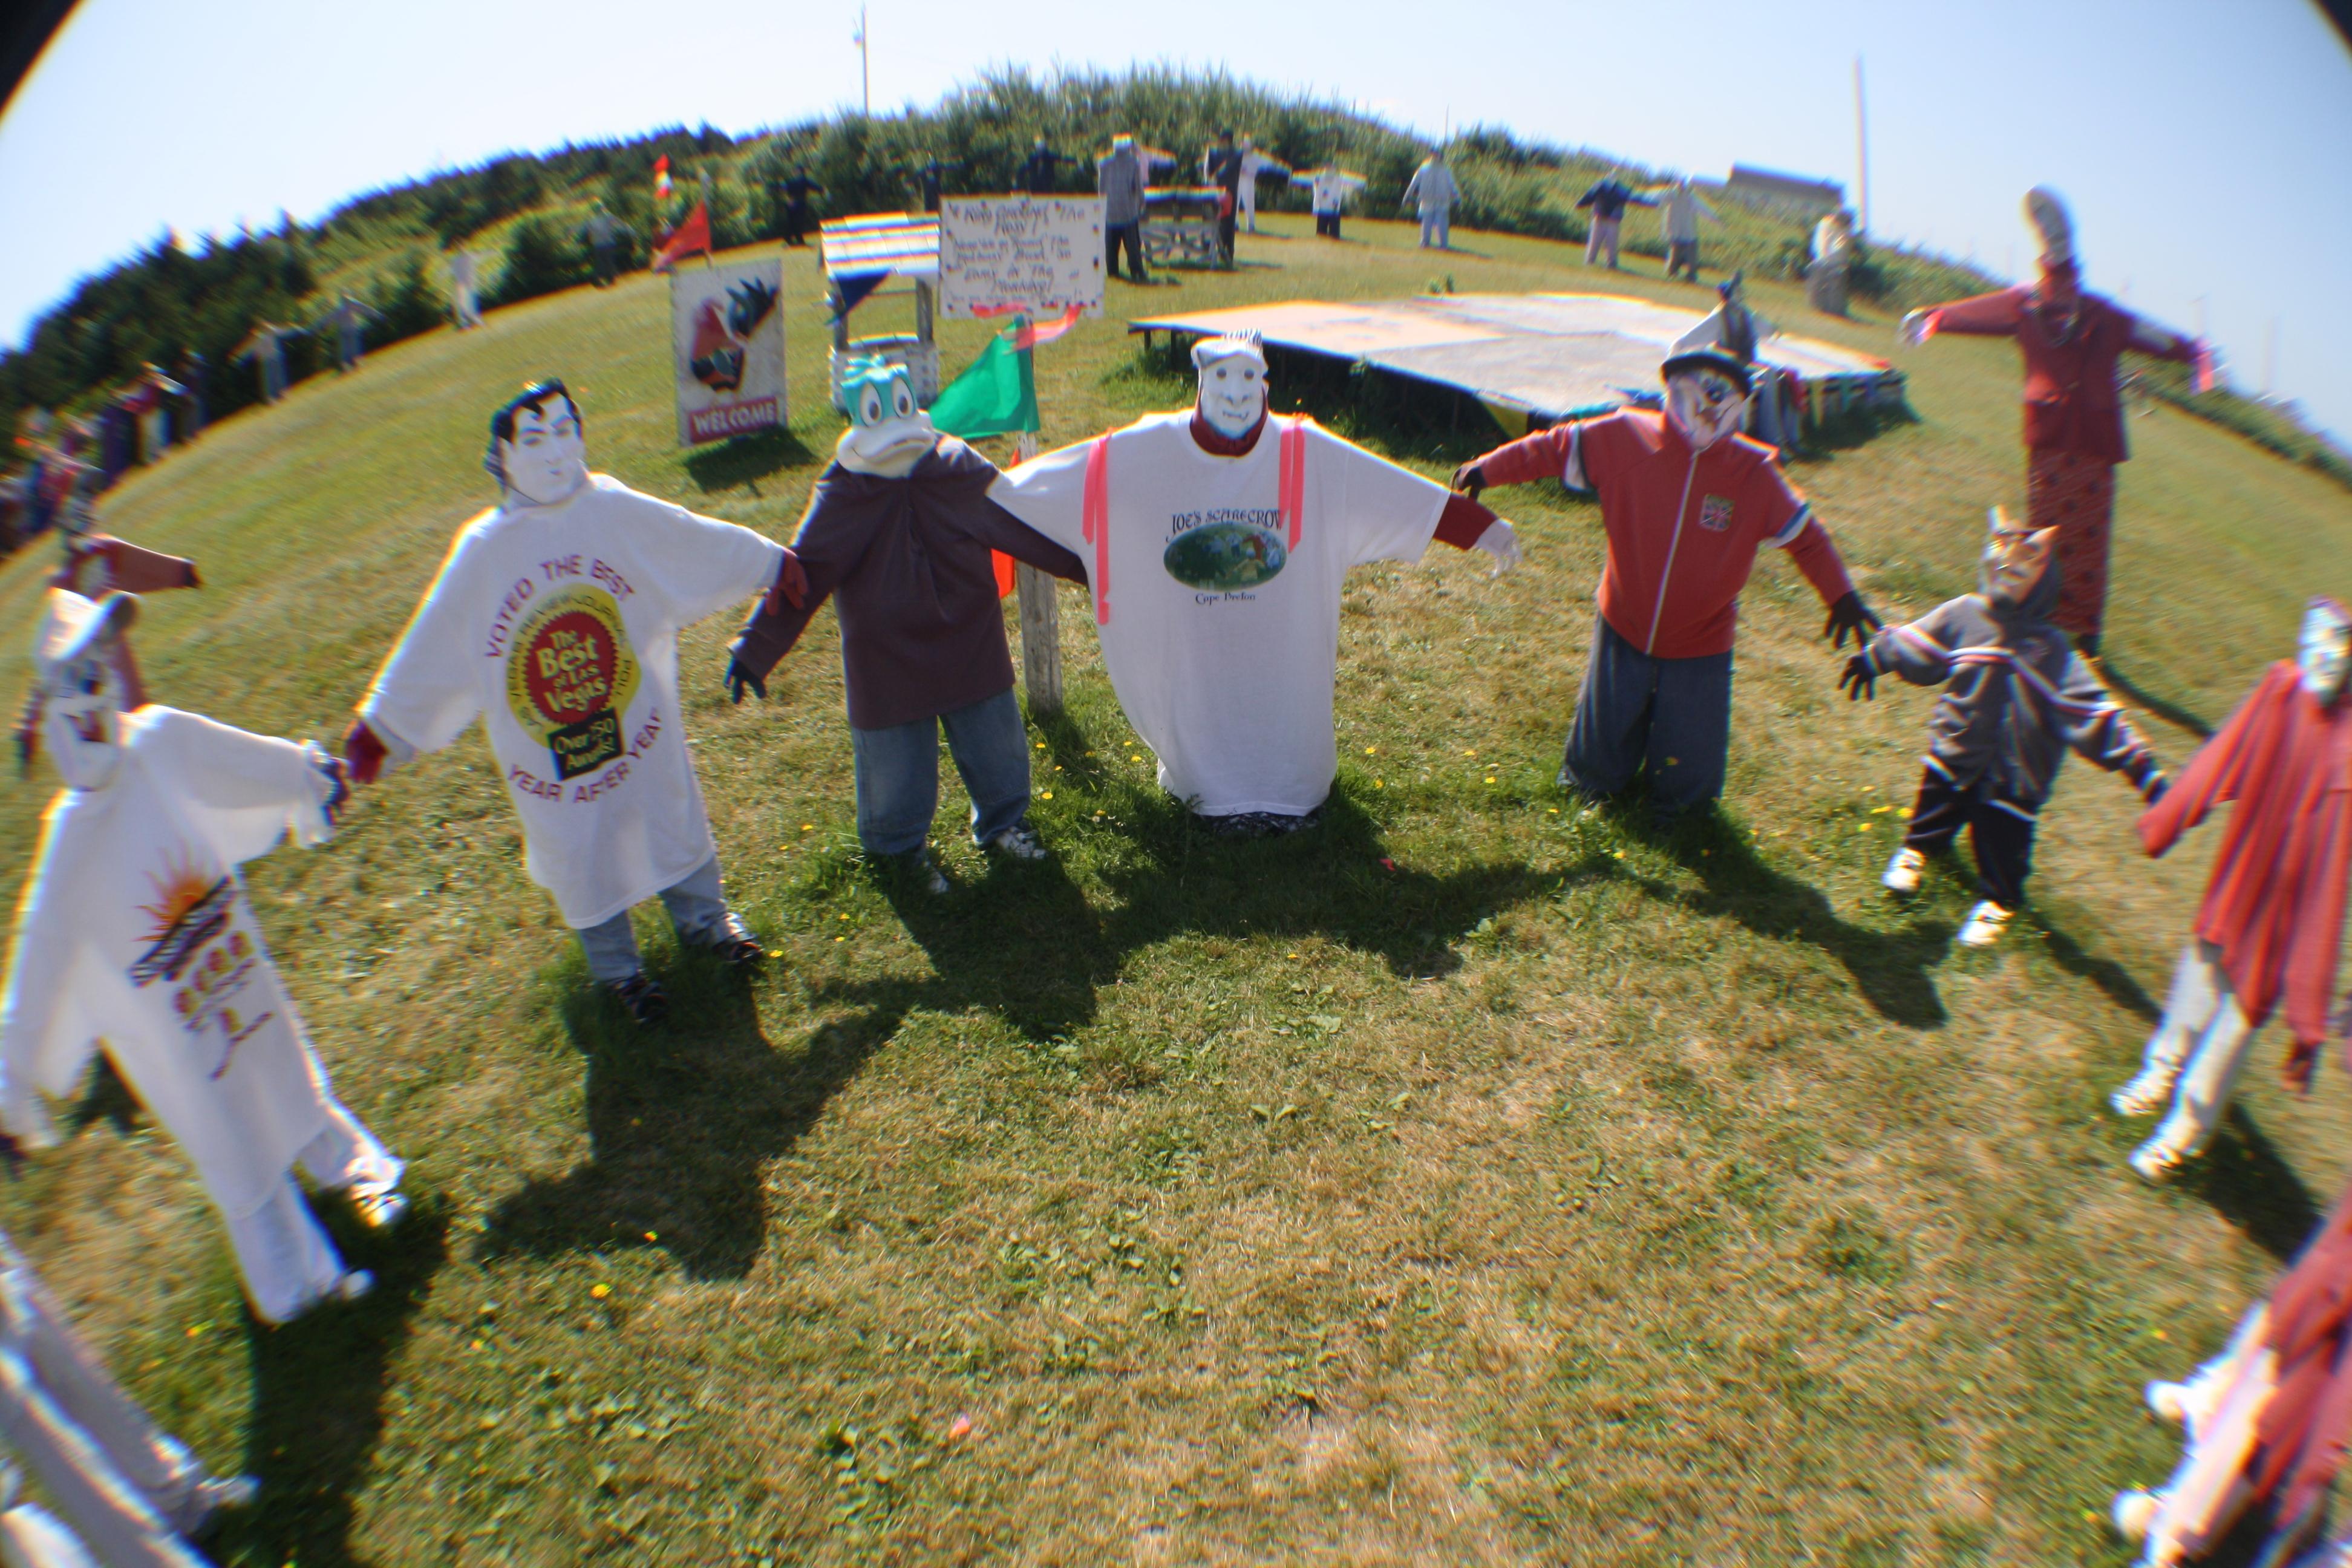 Circle_of_scarecrow_children_at_Joe%27s_Scarecrow_Village.JPG